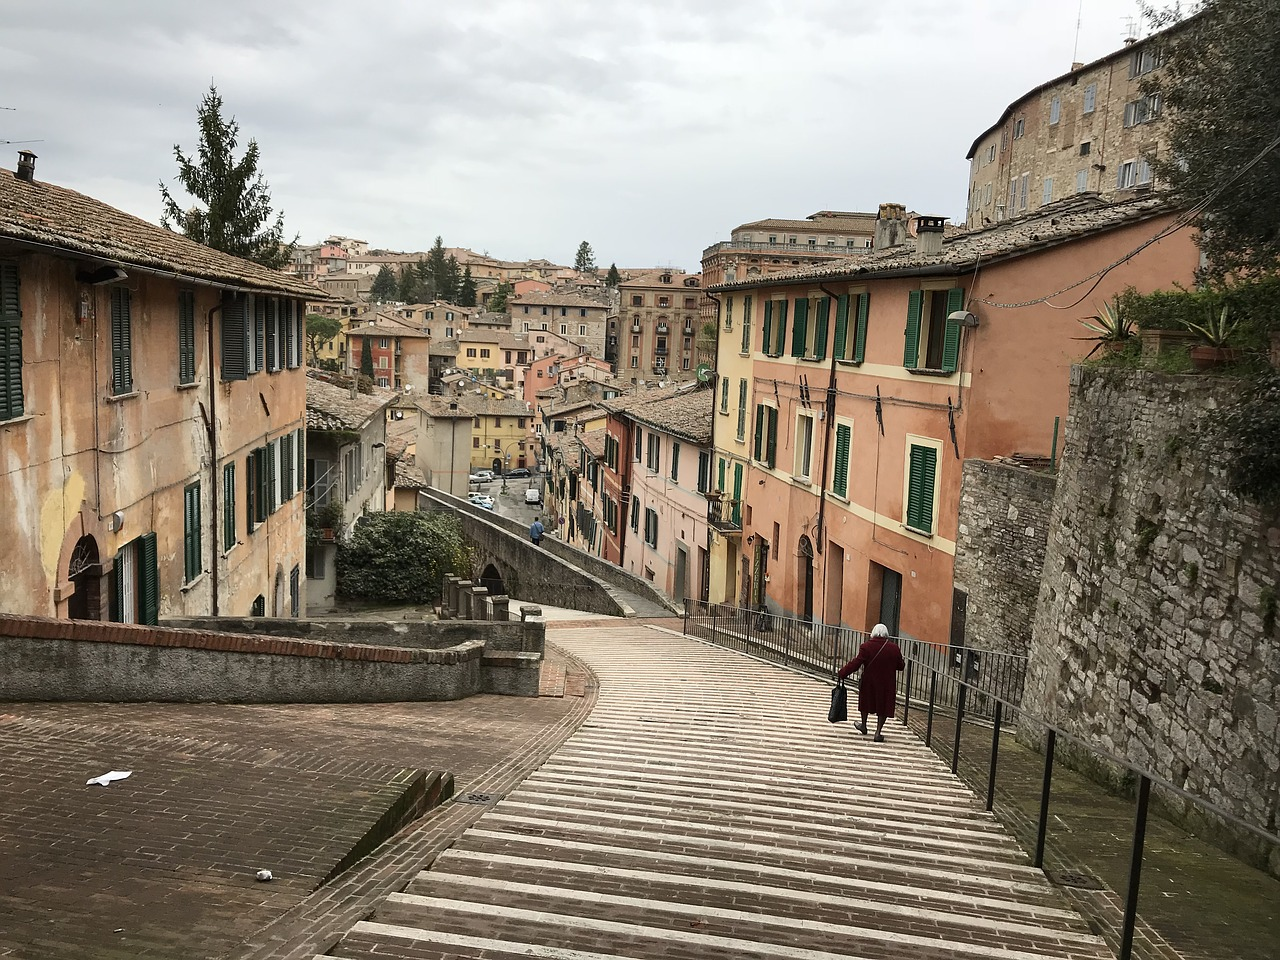 Risultati elezioni regionali Umbria 2019